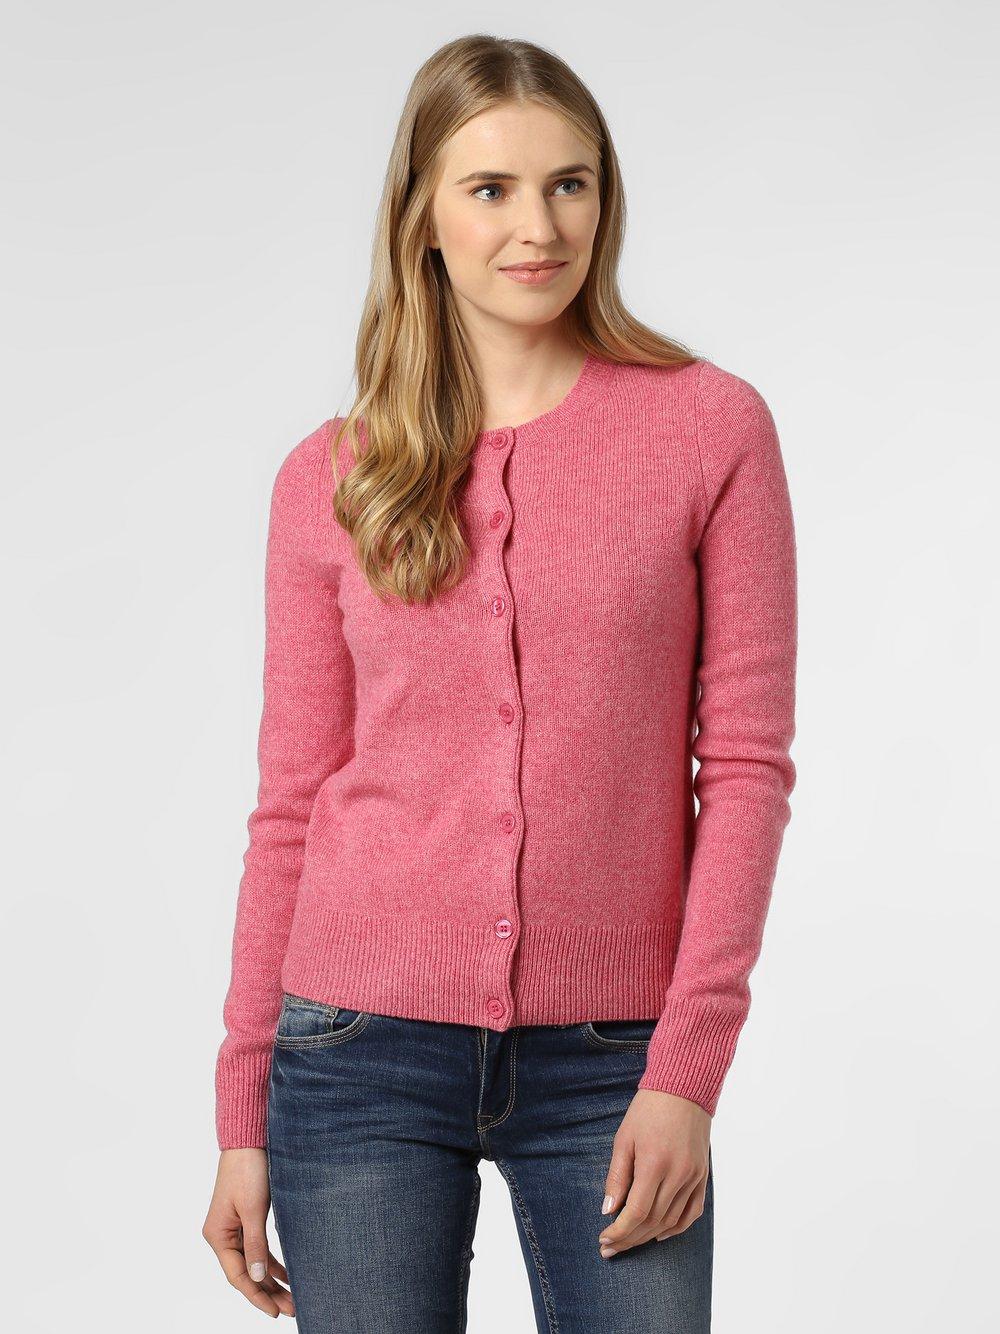 brookshire - Kardigan damski, różowy